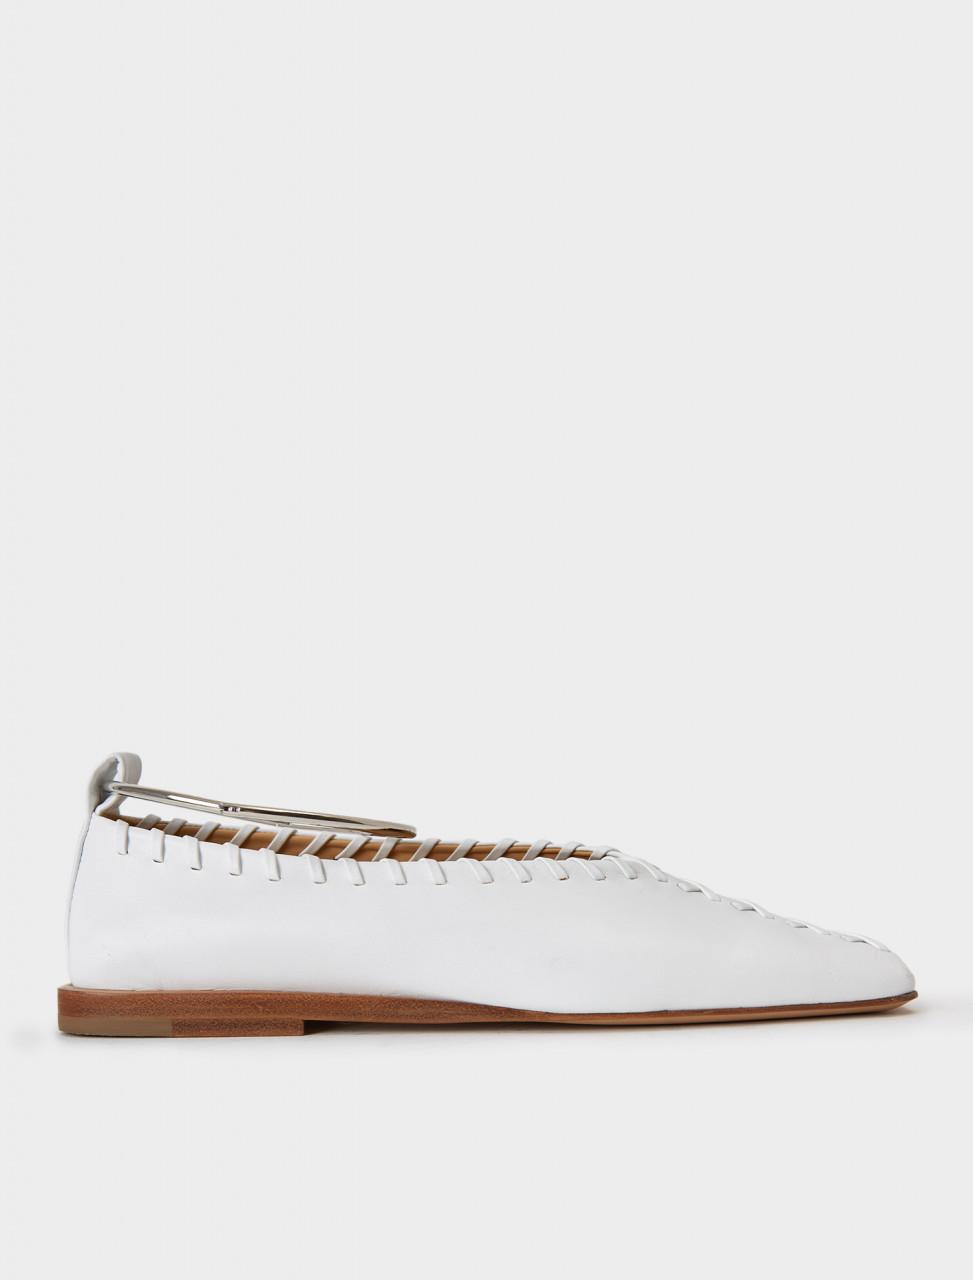 130-JS30217A-12012-100 JIL SANDER Anklet Ballerina Flat in White